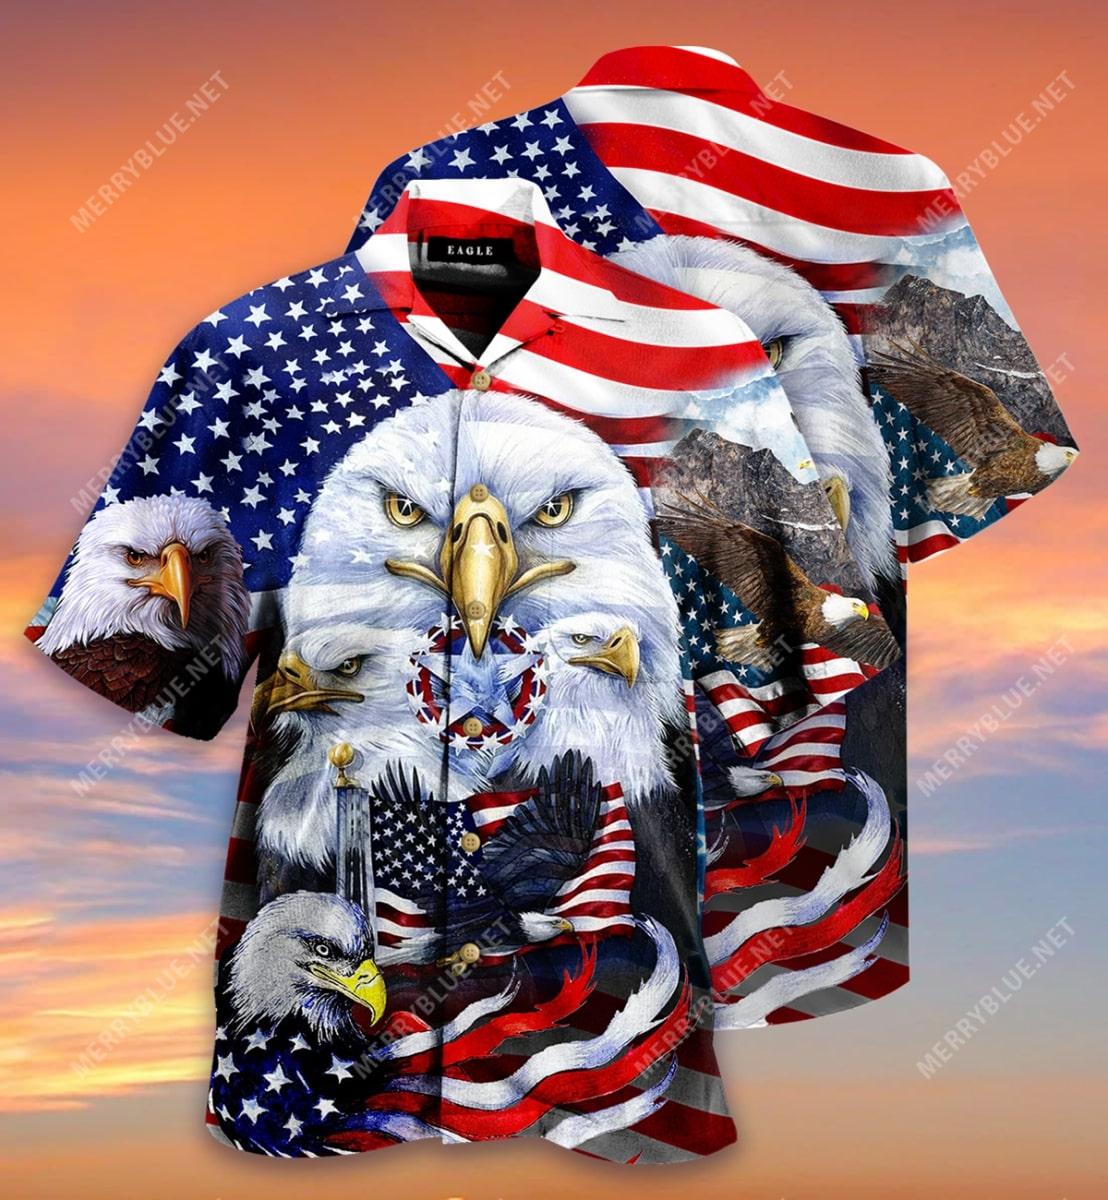 eagles patriotic american flag all over printed hawaiian shirt 4